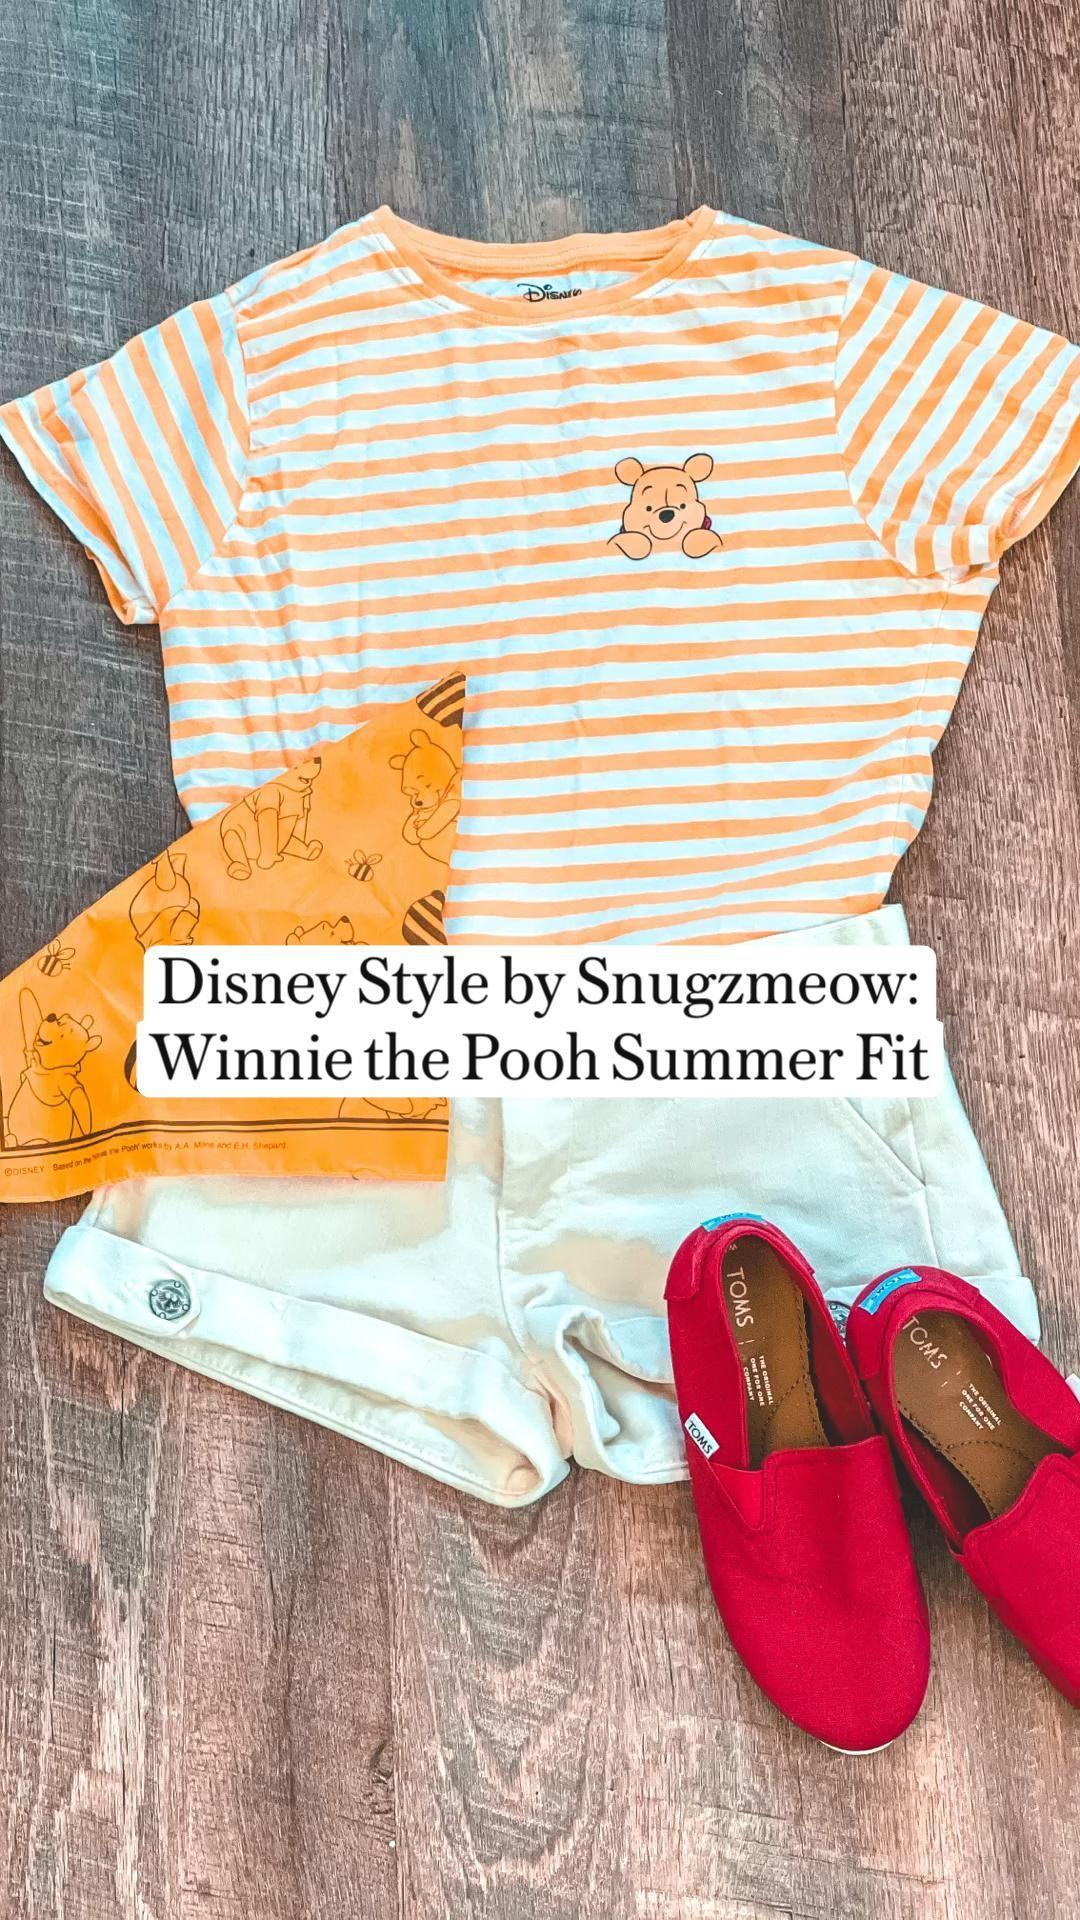 500+ Disney Style by Snugzmeow  Winnie the Pooh Summer Fit